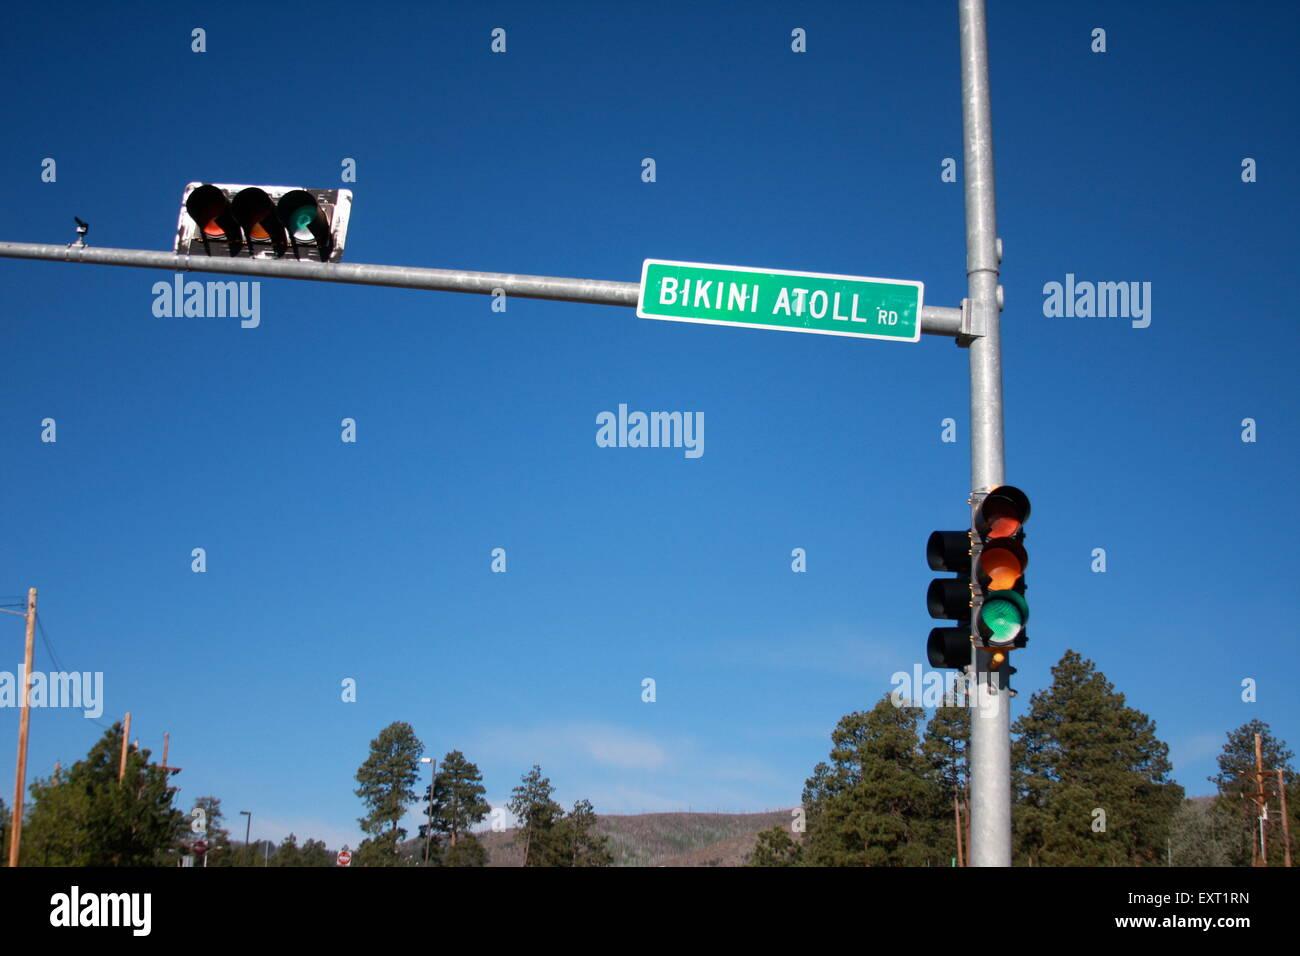 Bikini Atoll road sign in New Mexico USA - Stock Image